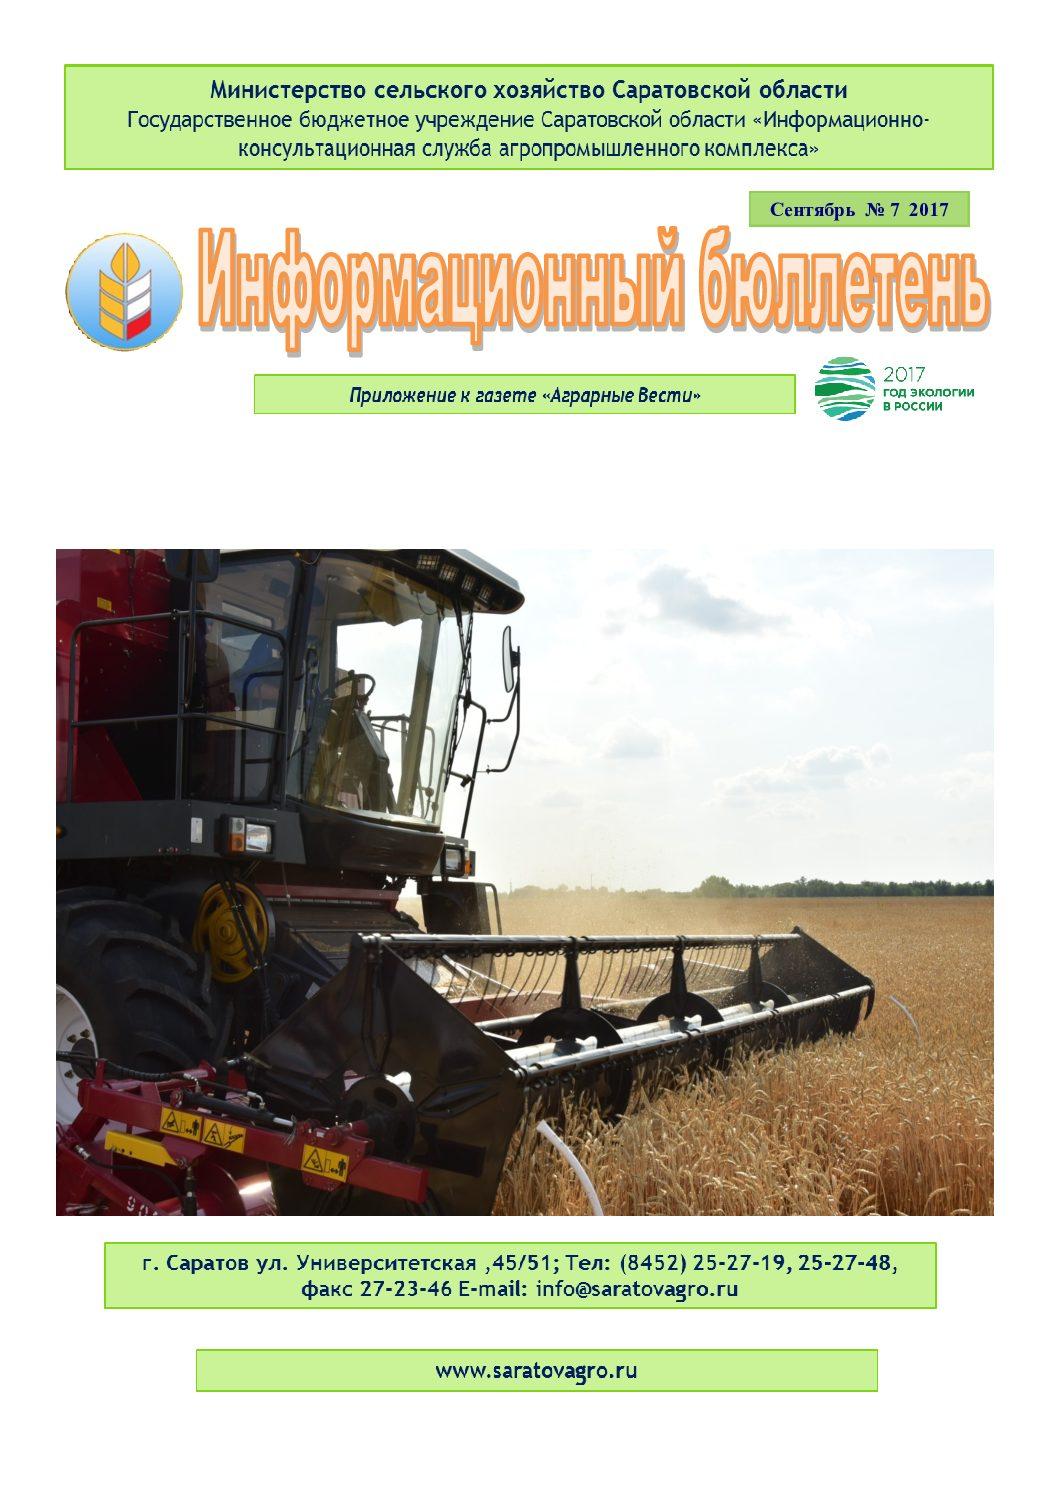 https://saratovagro.ru/wp-content/uploads/2020/08/7.2017-pdf.jpg